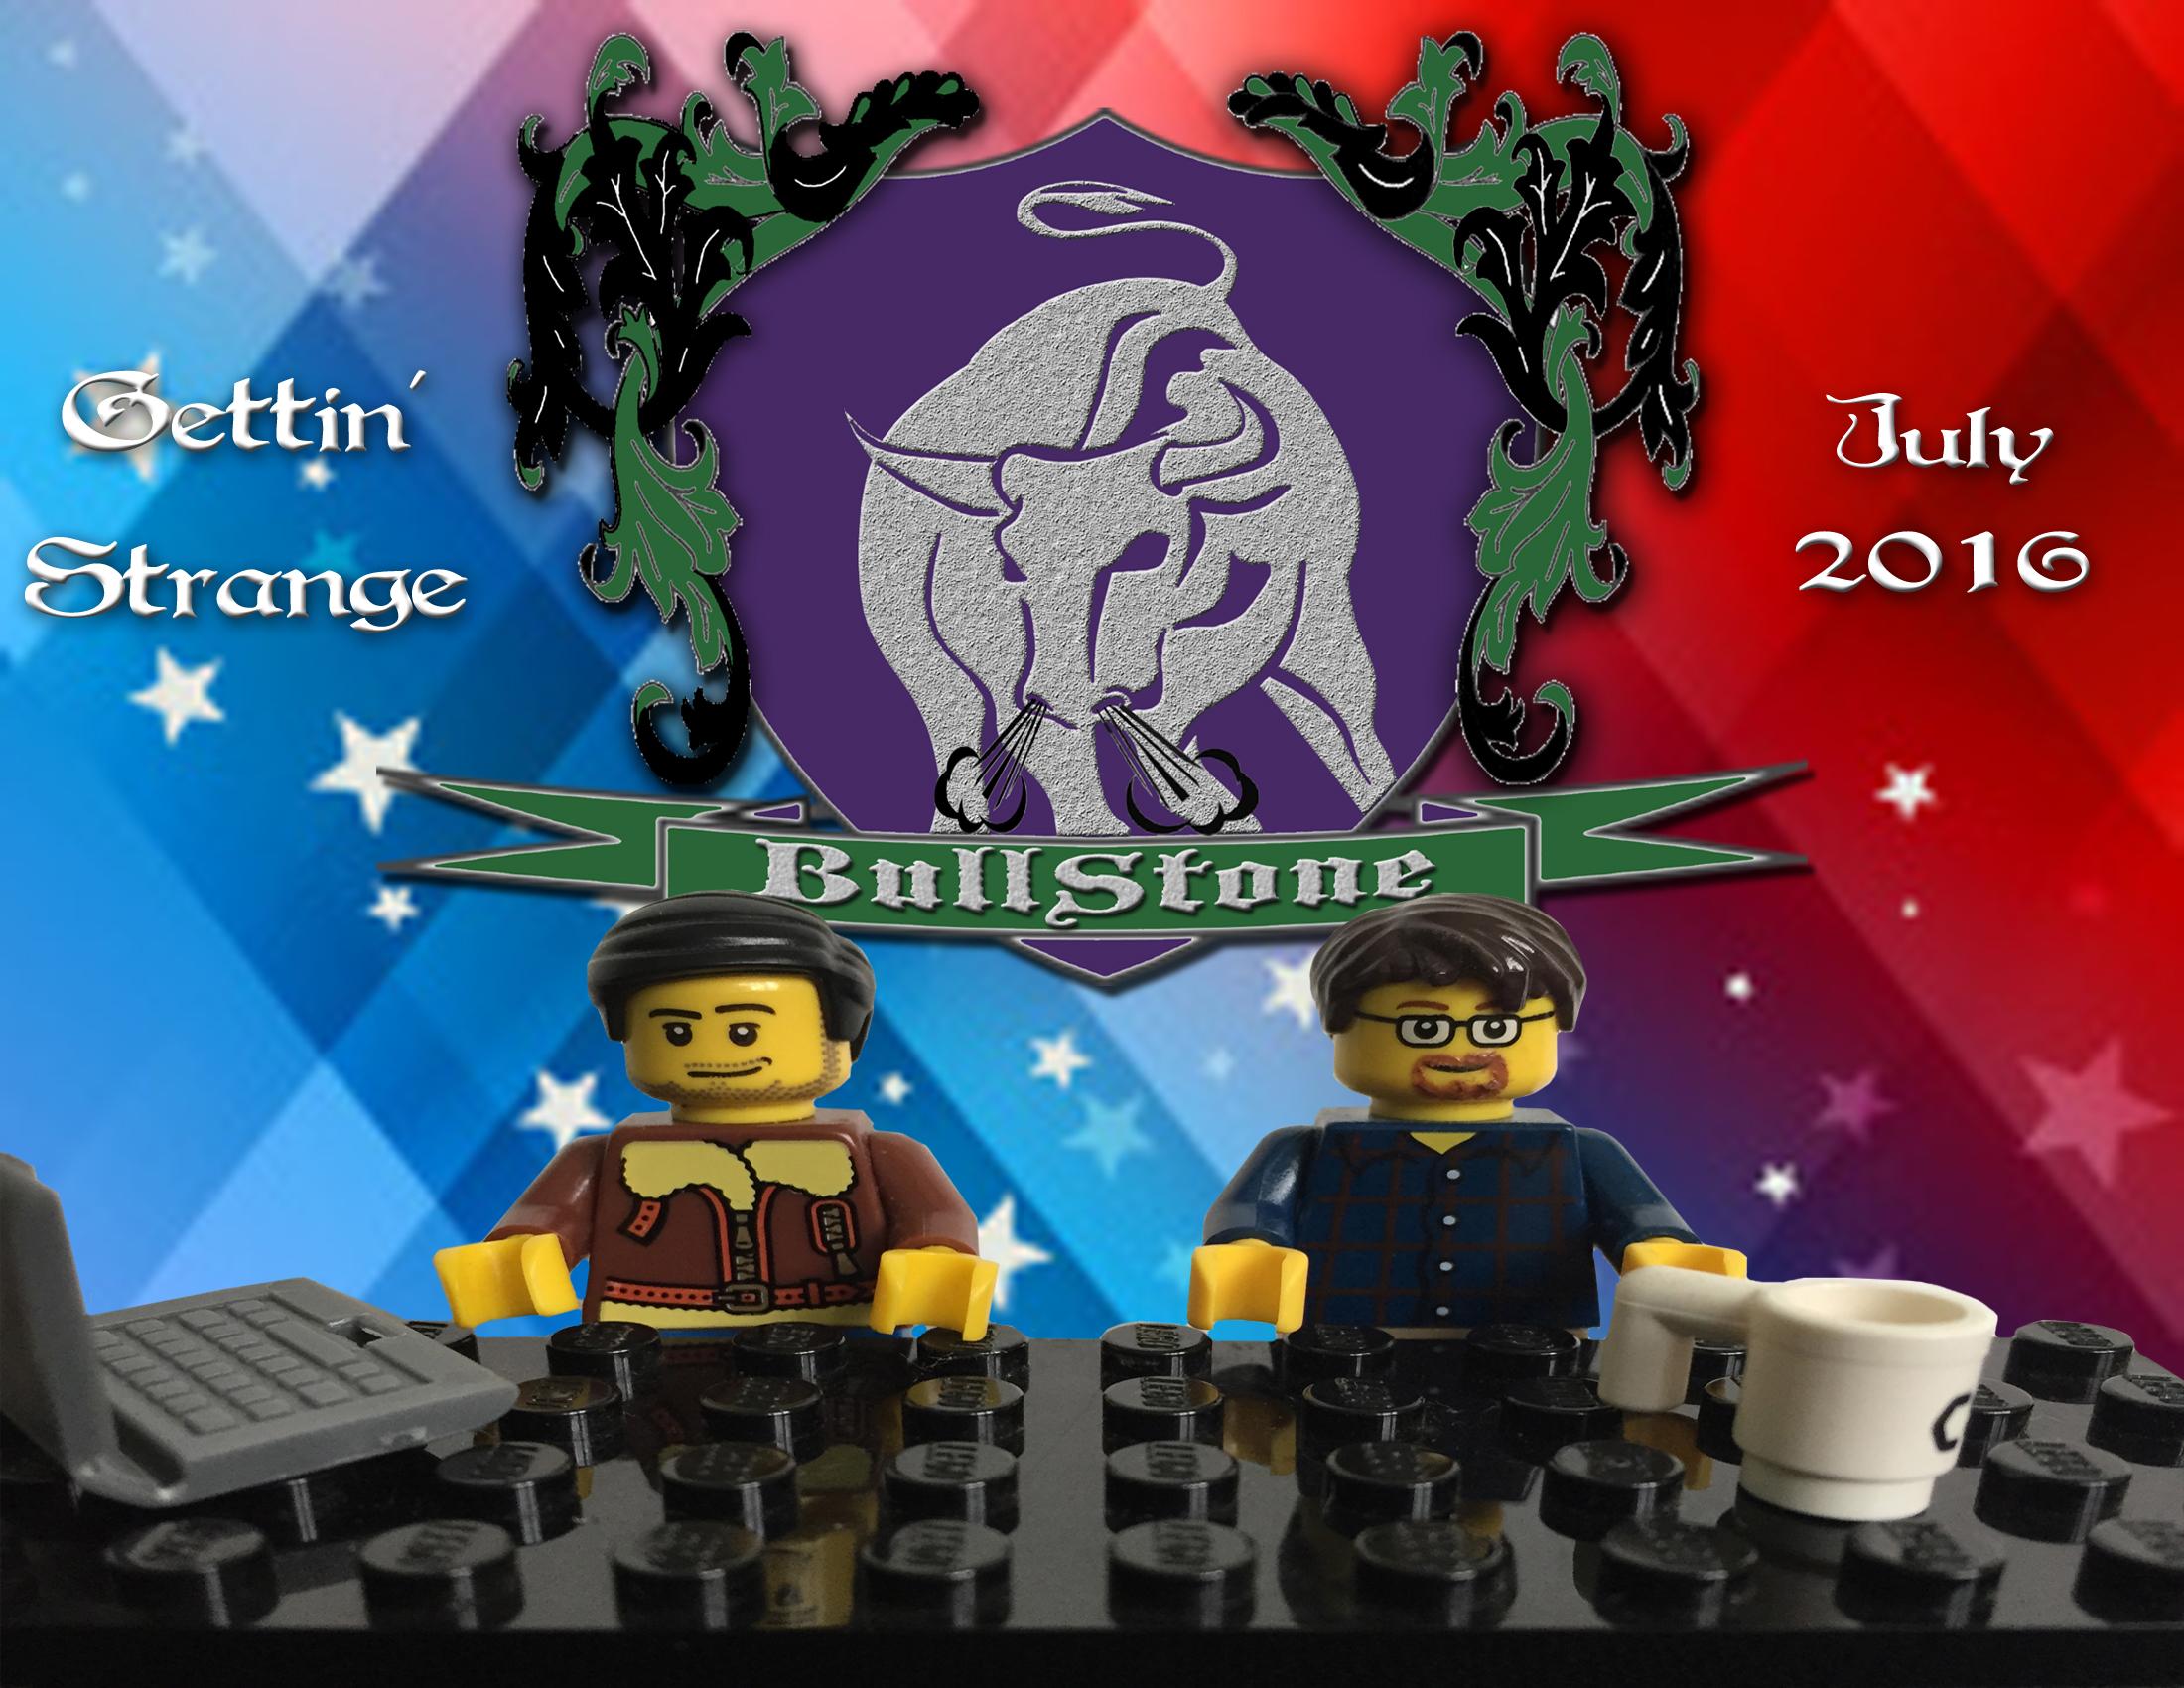 BullStone 19: Gettin' Strange, July 2016